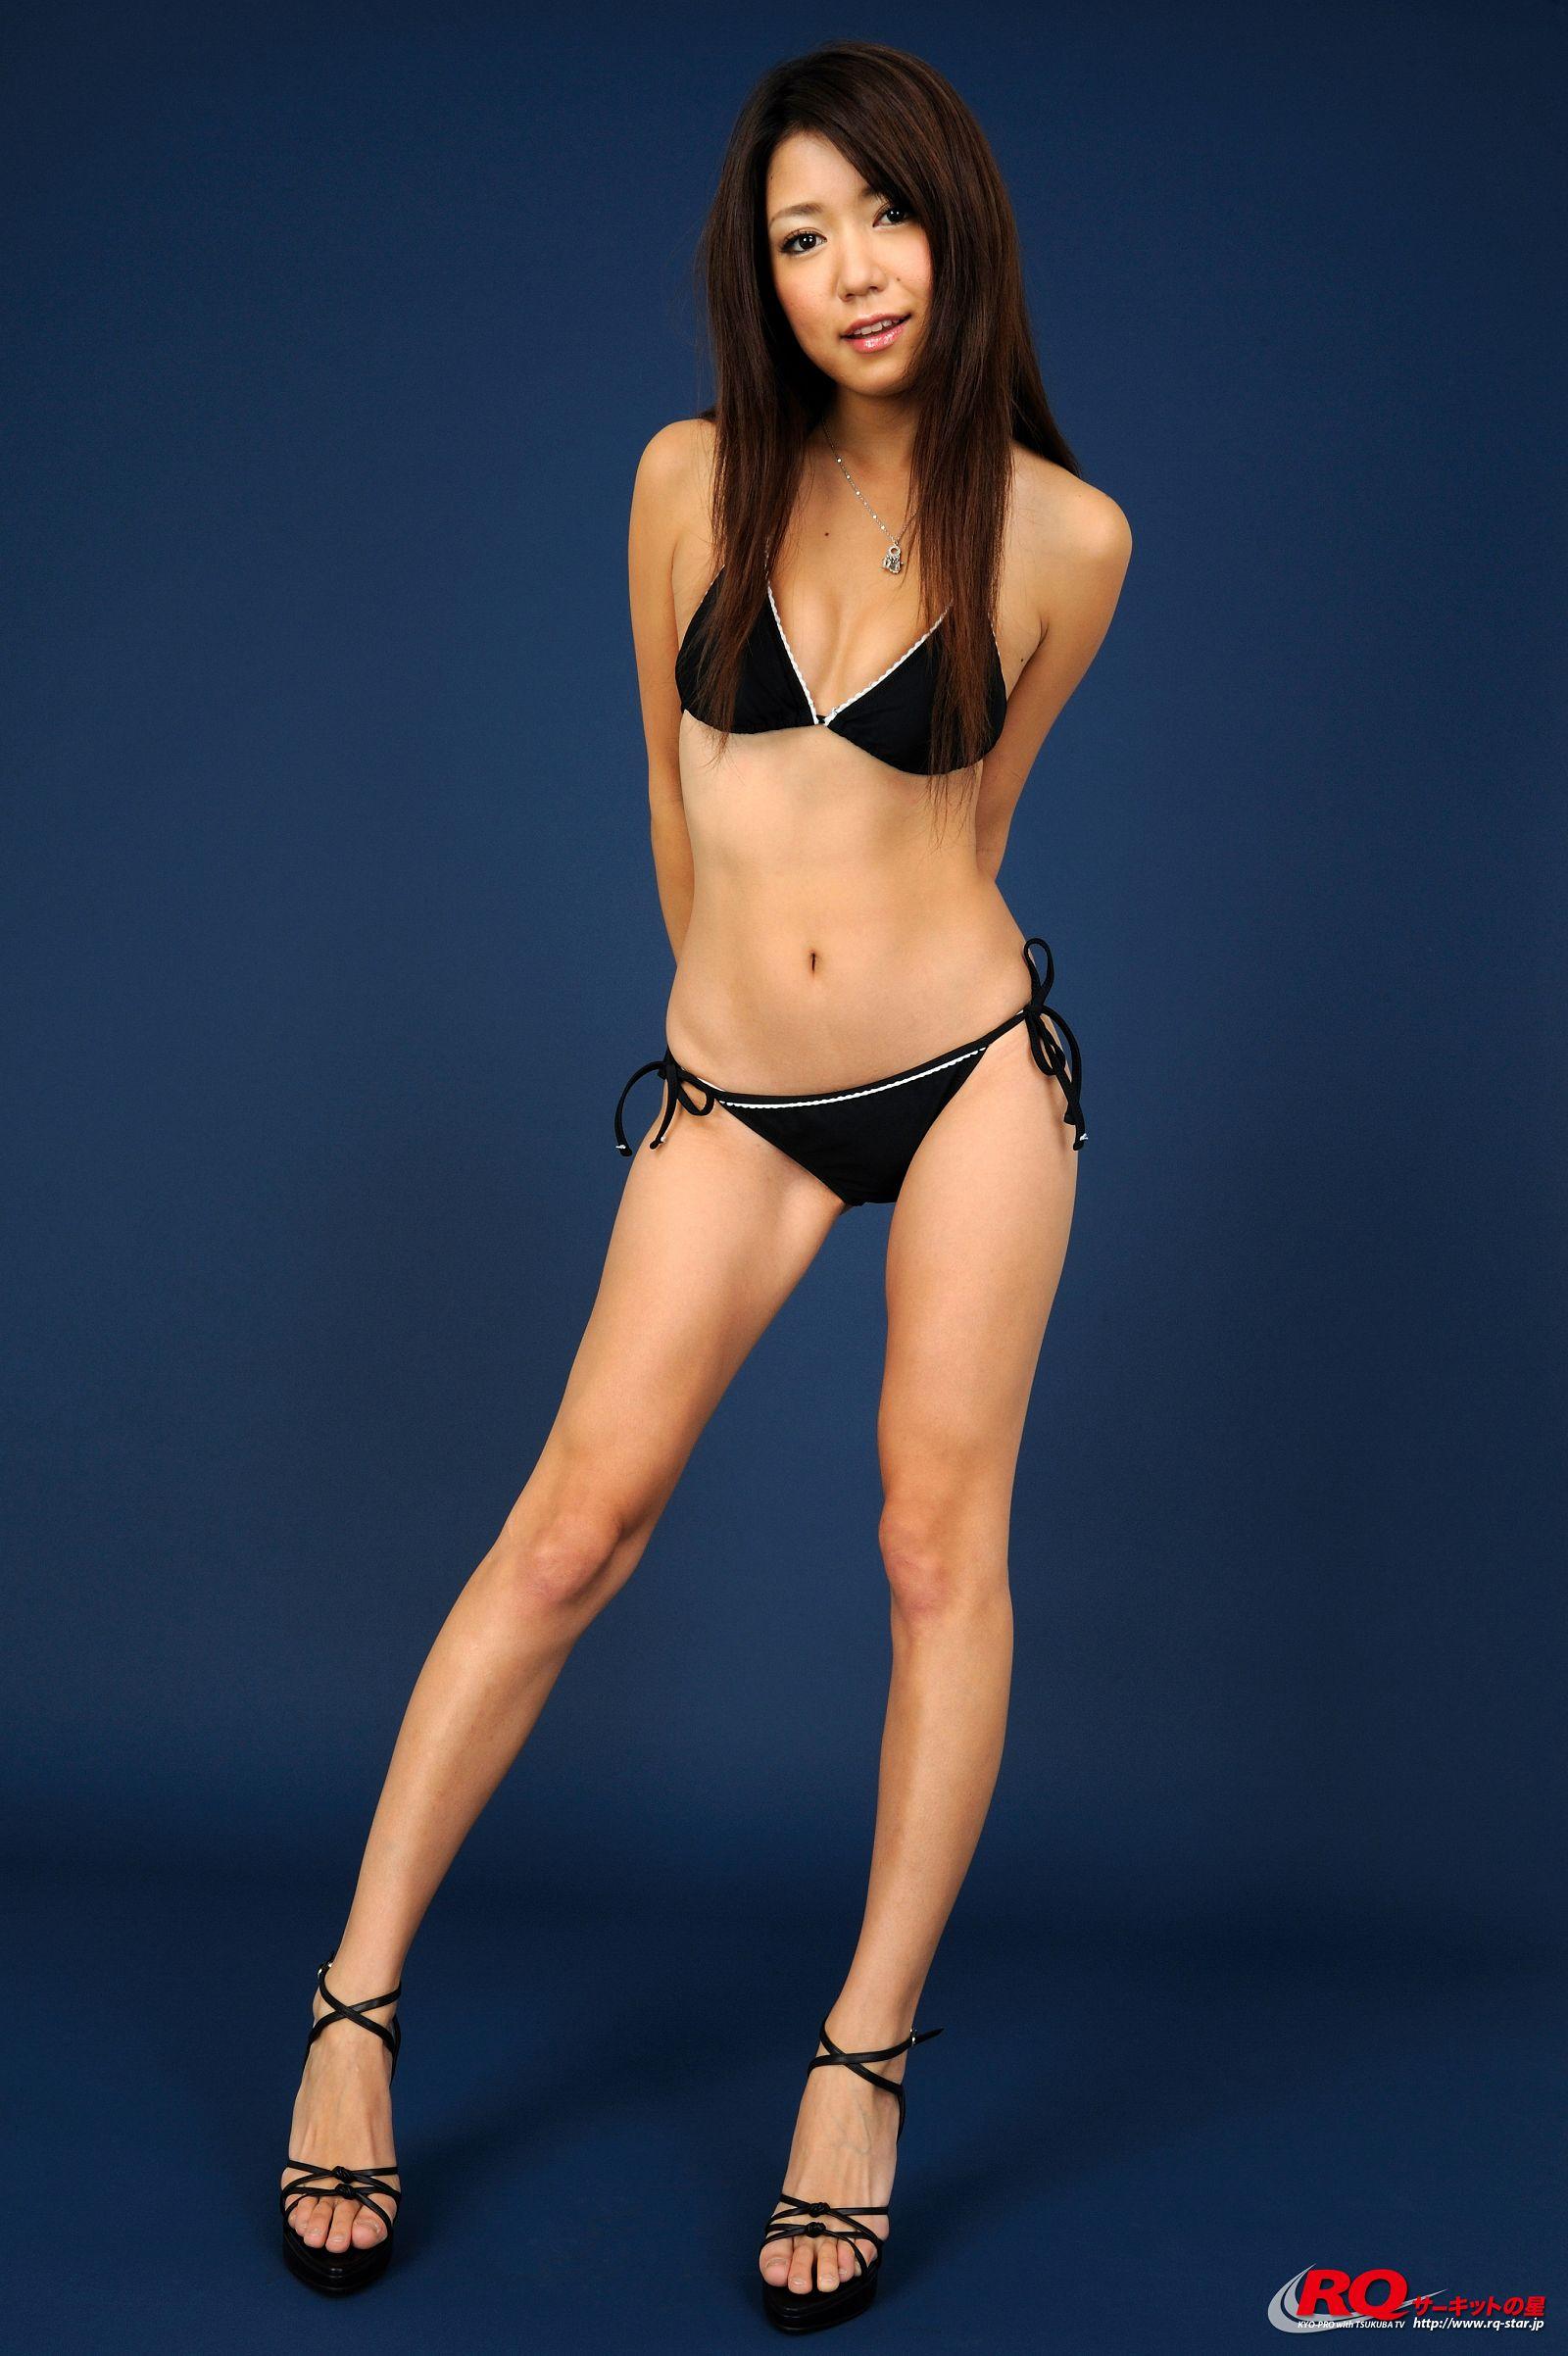 [RQ STAR美女] NO.00111 Keiko Inagaki 稲垣慶子 Swim Suits Black[100P] RQ STAR 第2张